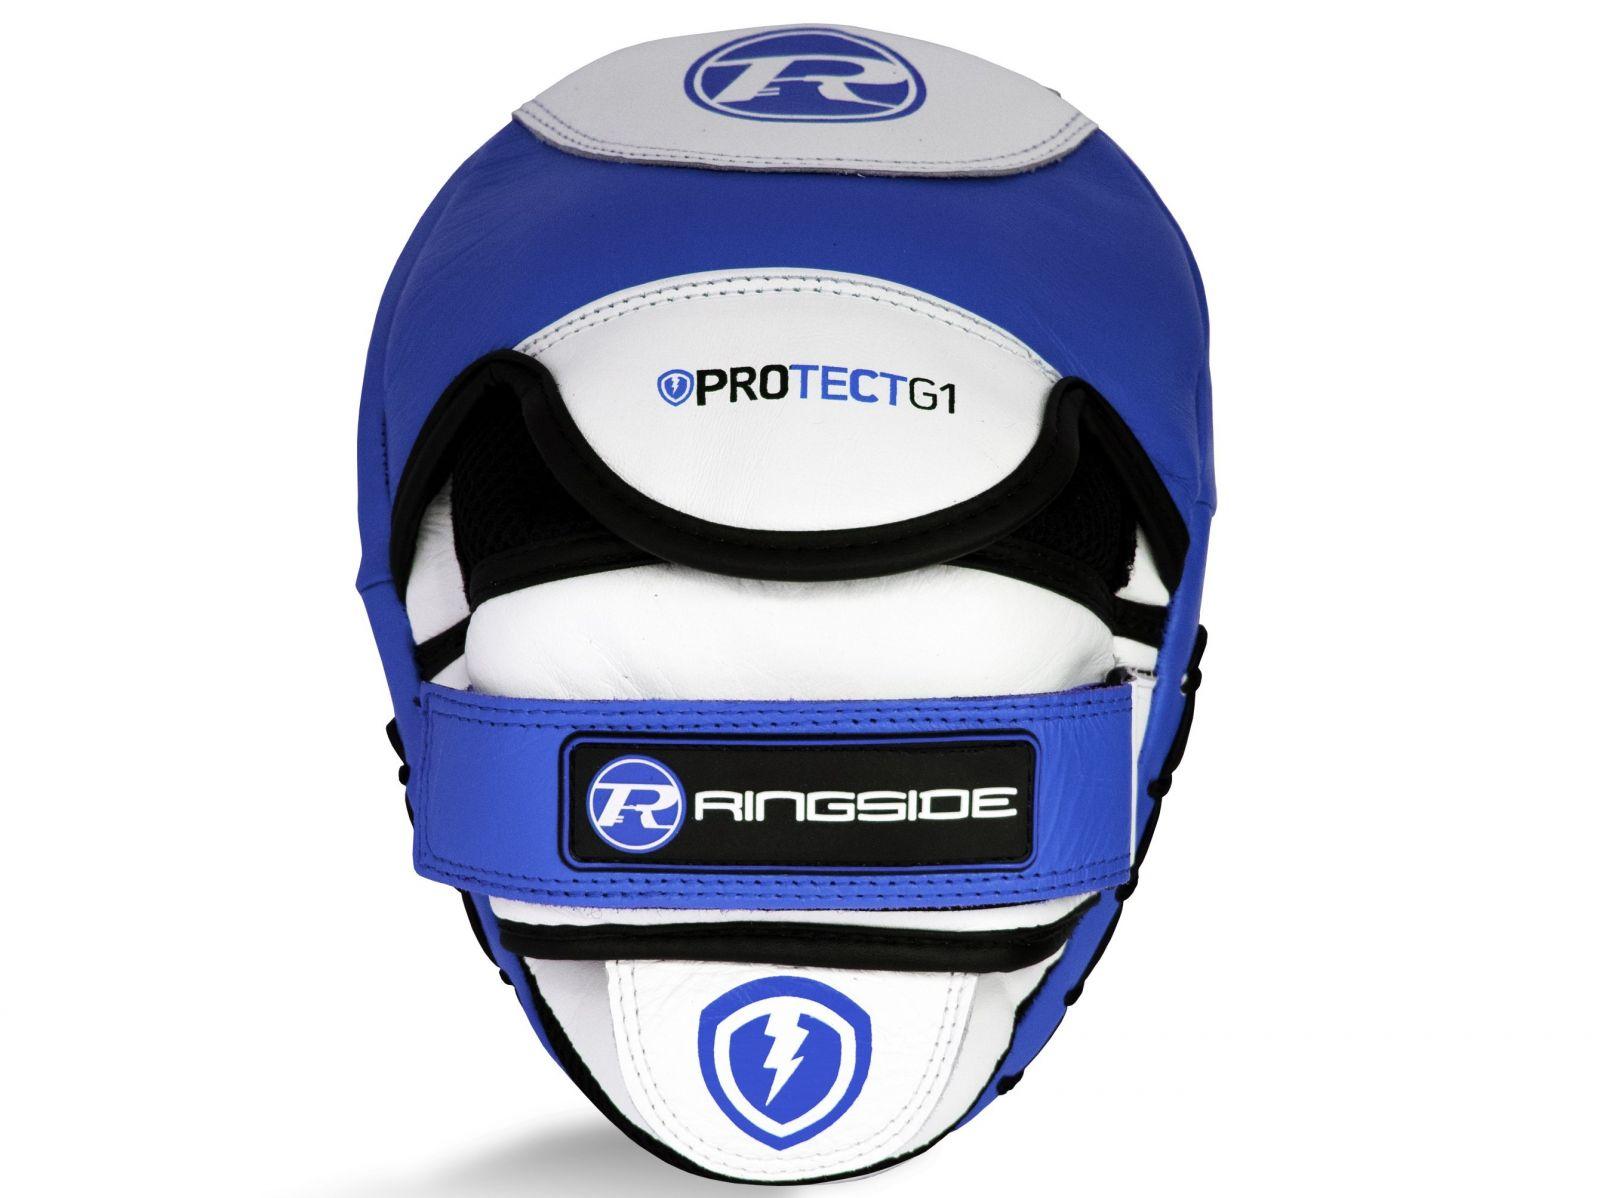 RINGSIDE Lapy Protect G1 Hook & Jab - modrá/bílá/černá